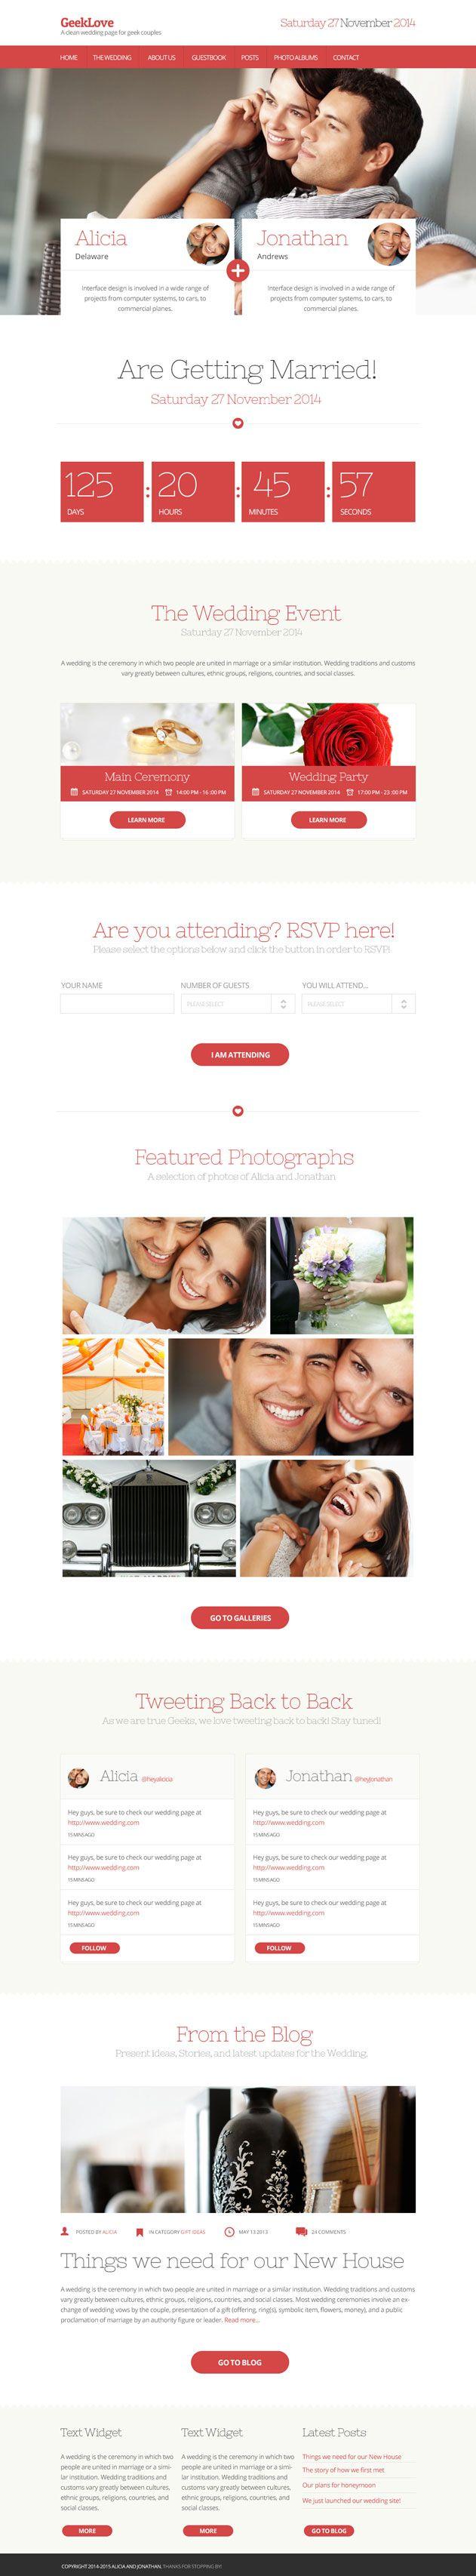 geeklove-responsive-wedding-theme #weddingwebsite #websitetheme #trends2014